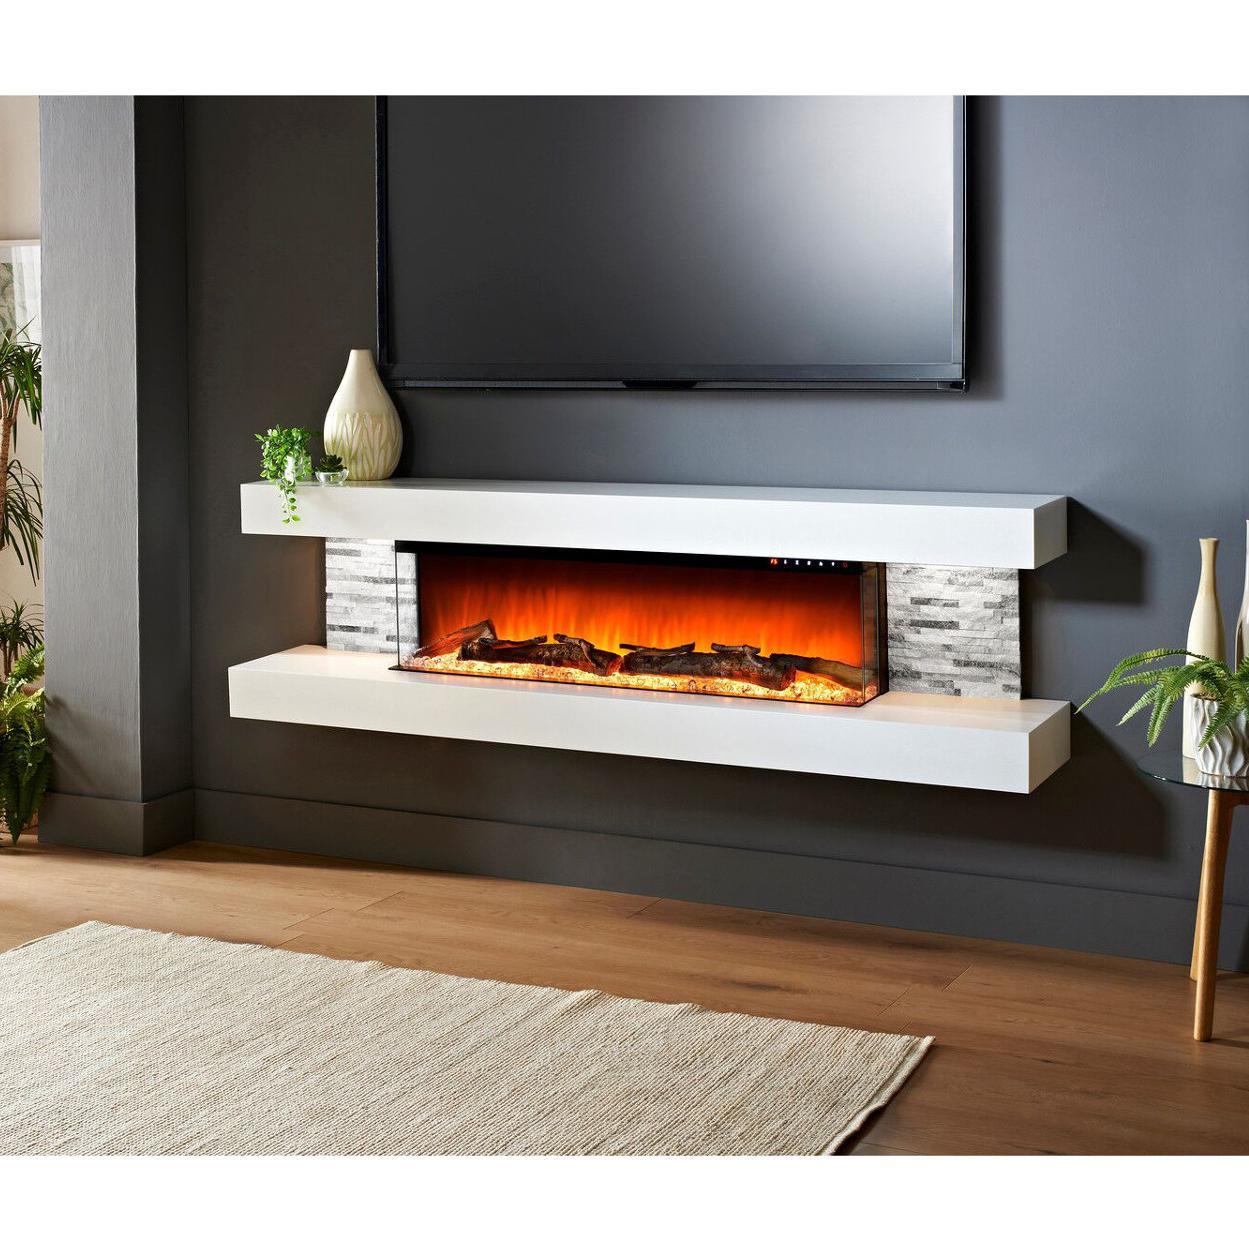 Evolution Fires Efv72w Vegas 72 Inch Wall Mount Electric Fireplace